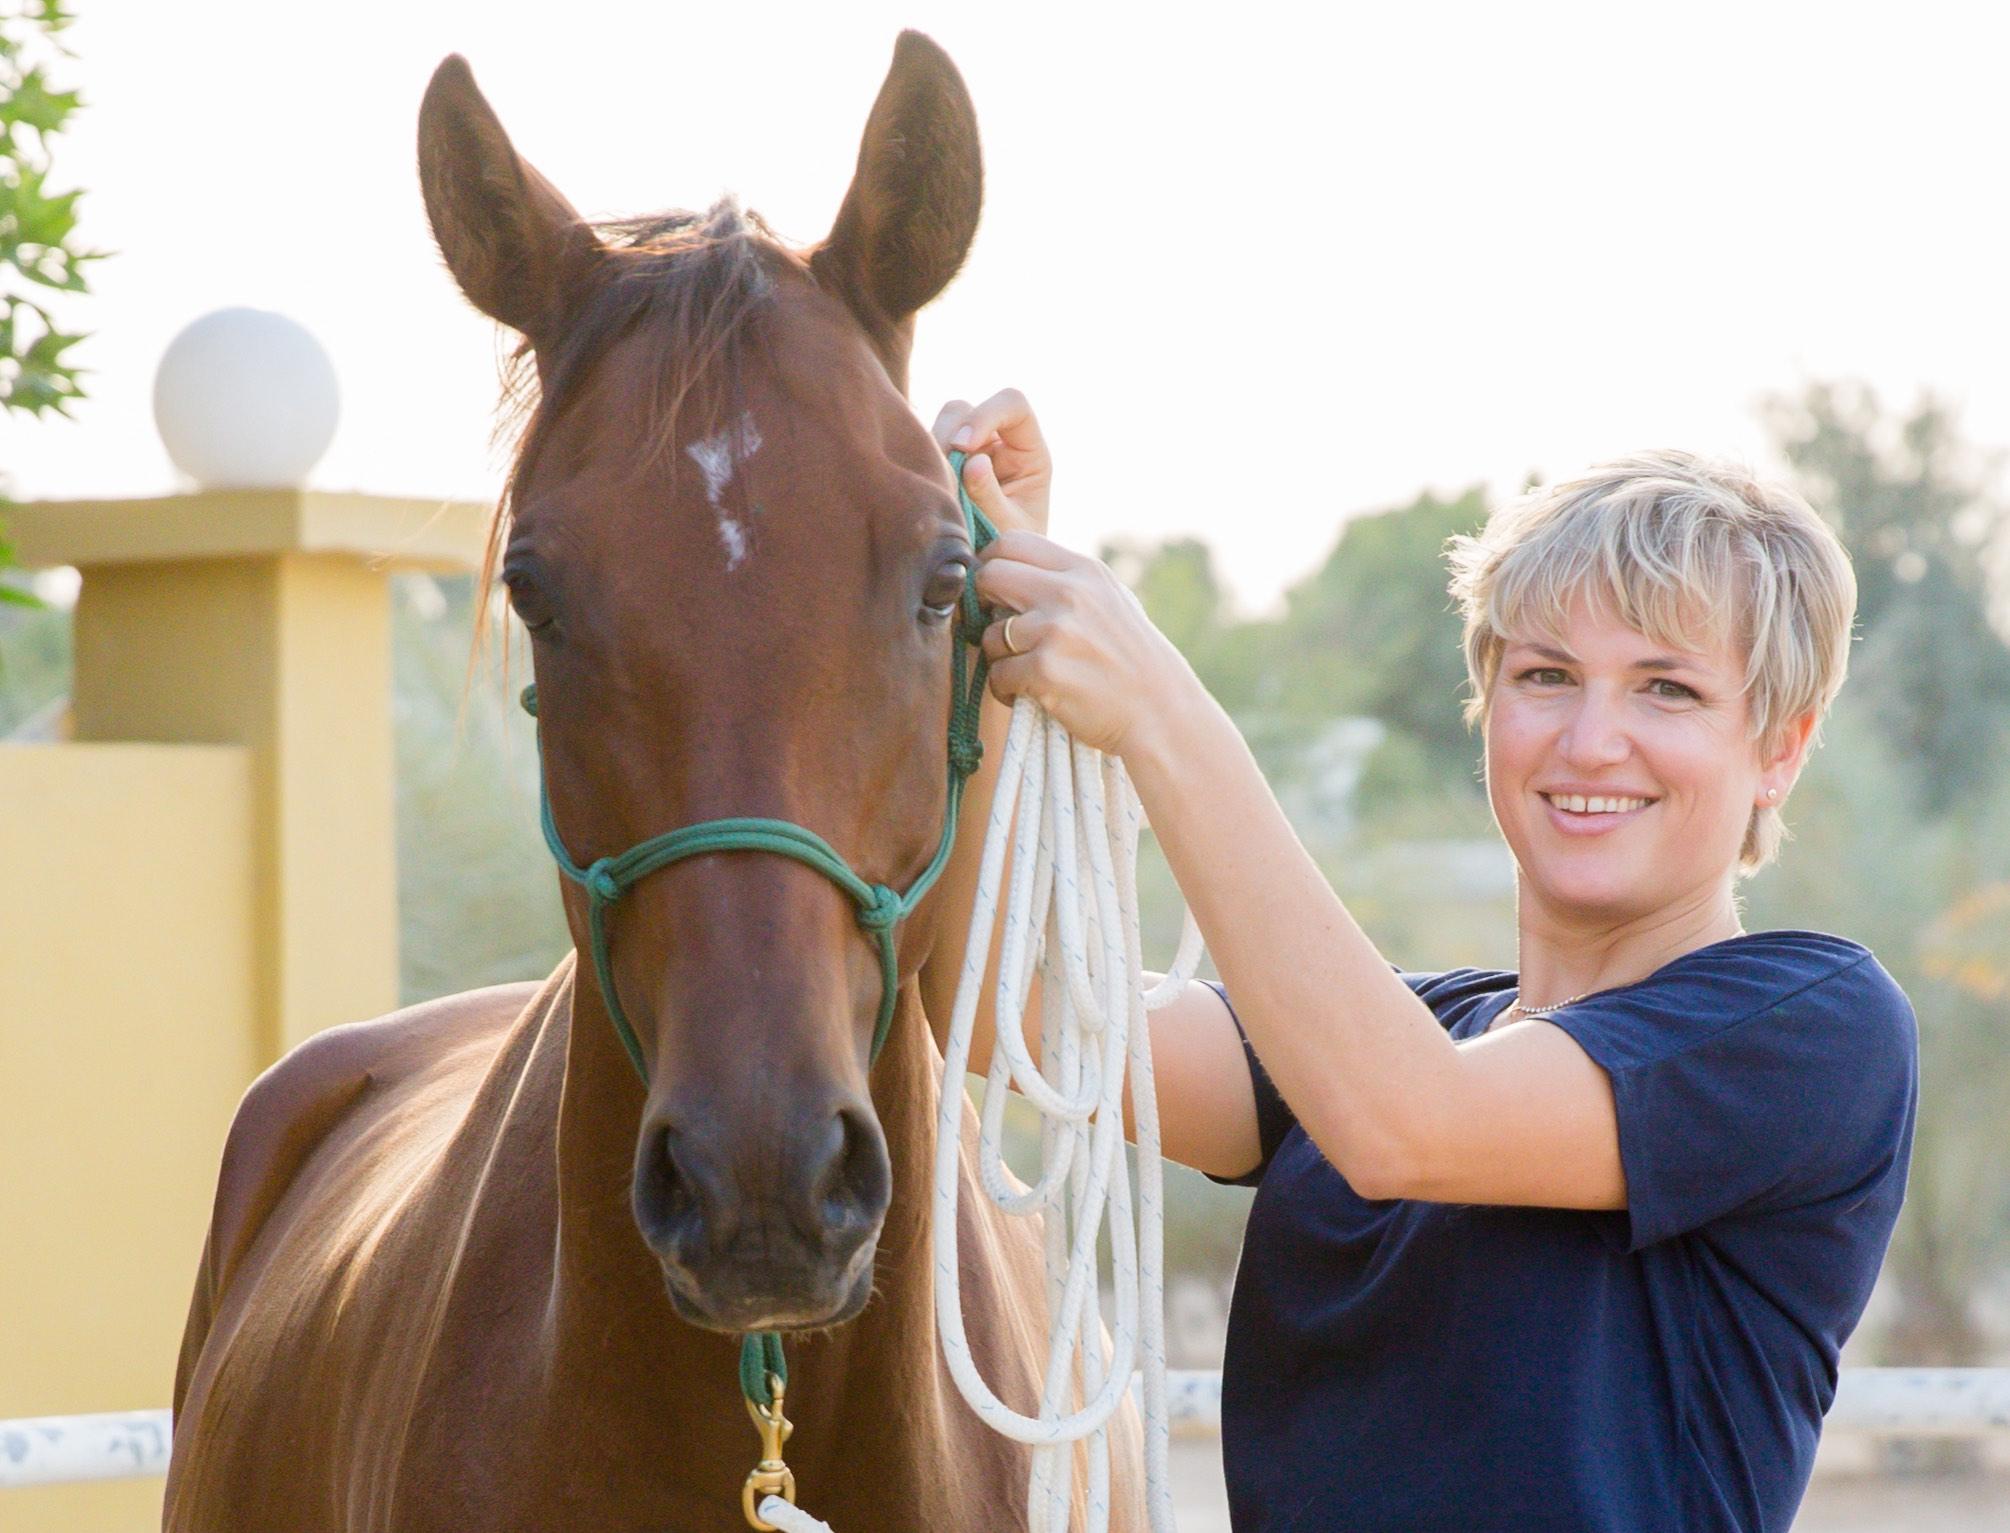 Contact Leadership Dubai Course Horses corporate seminars